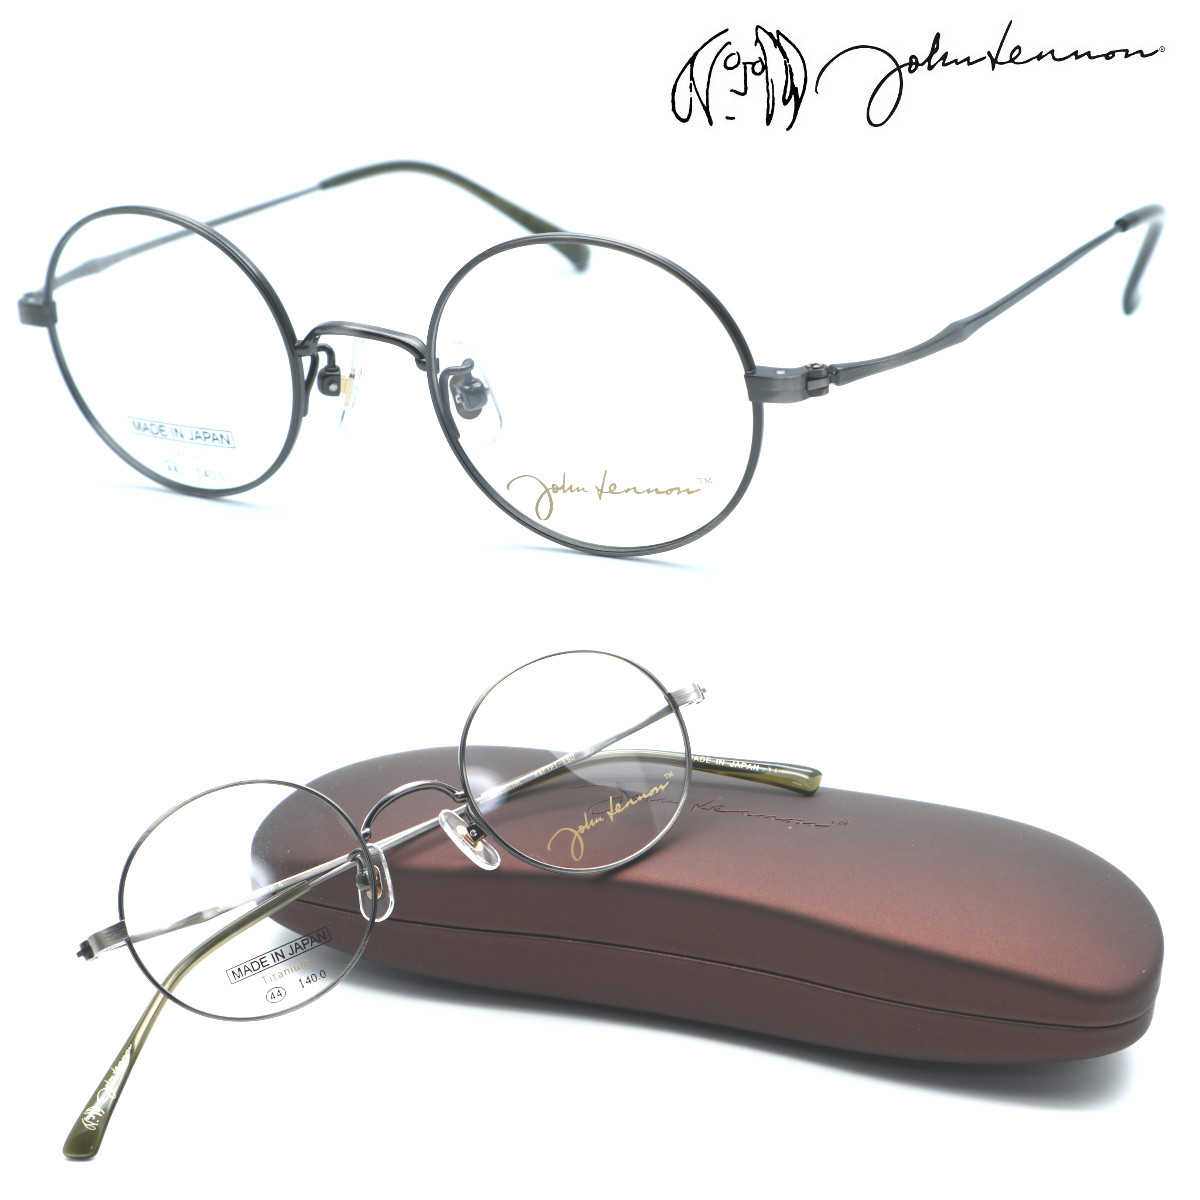 【john lennon】ジョンレノン JL-1085 col.4 メガネ 度付又は度無レンズセット 日本製 【正規品】【店内全品送料無料】【丸メガネ】